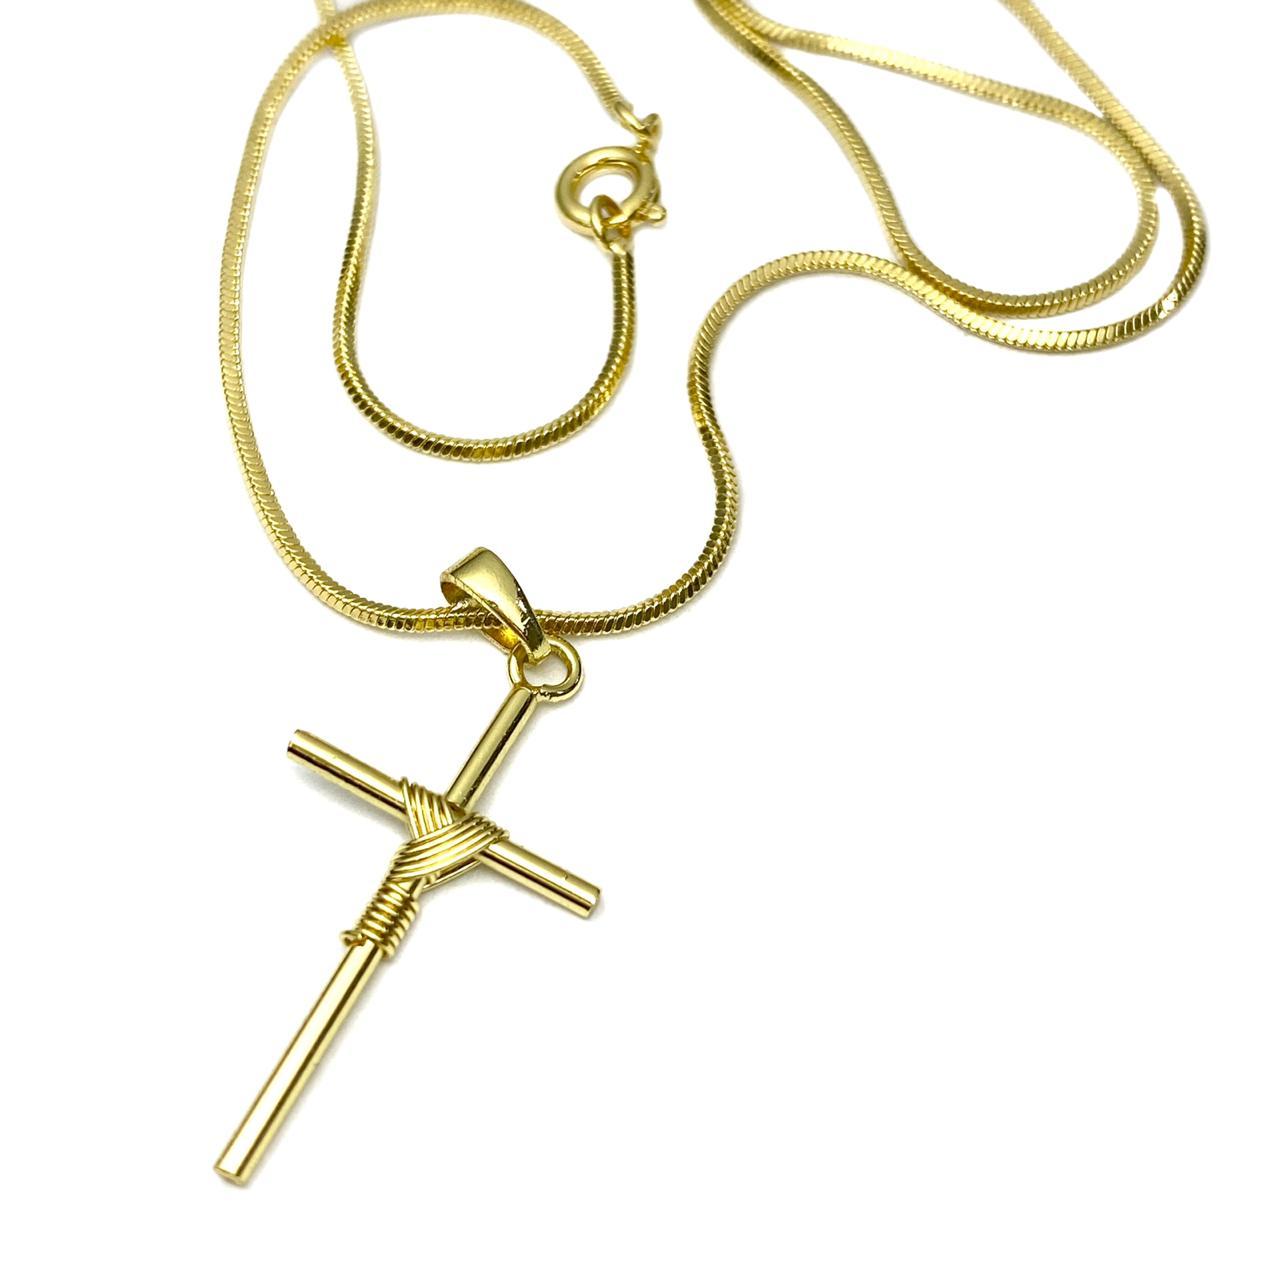 Kit 69 Corrente Rabo de Rato Q. 1,2mm 70cm (Fecho Tradicional) + Crucifixo Transado